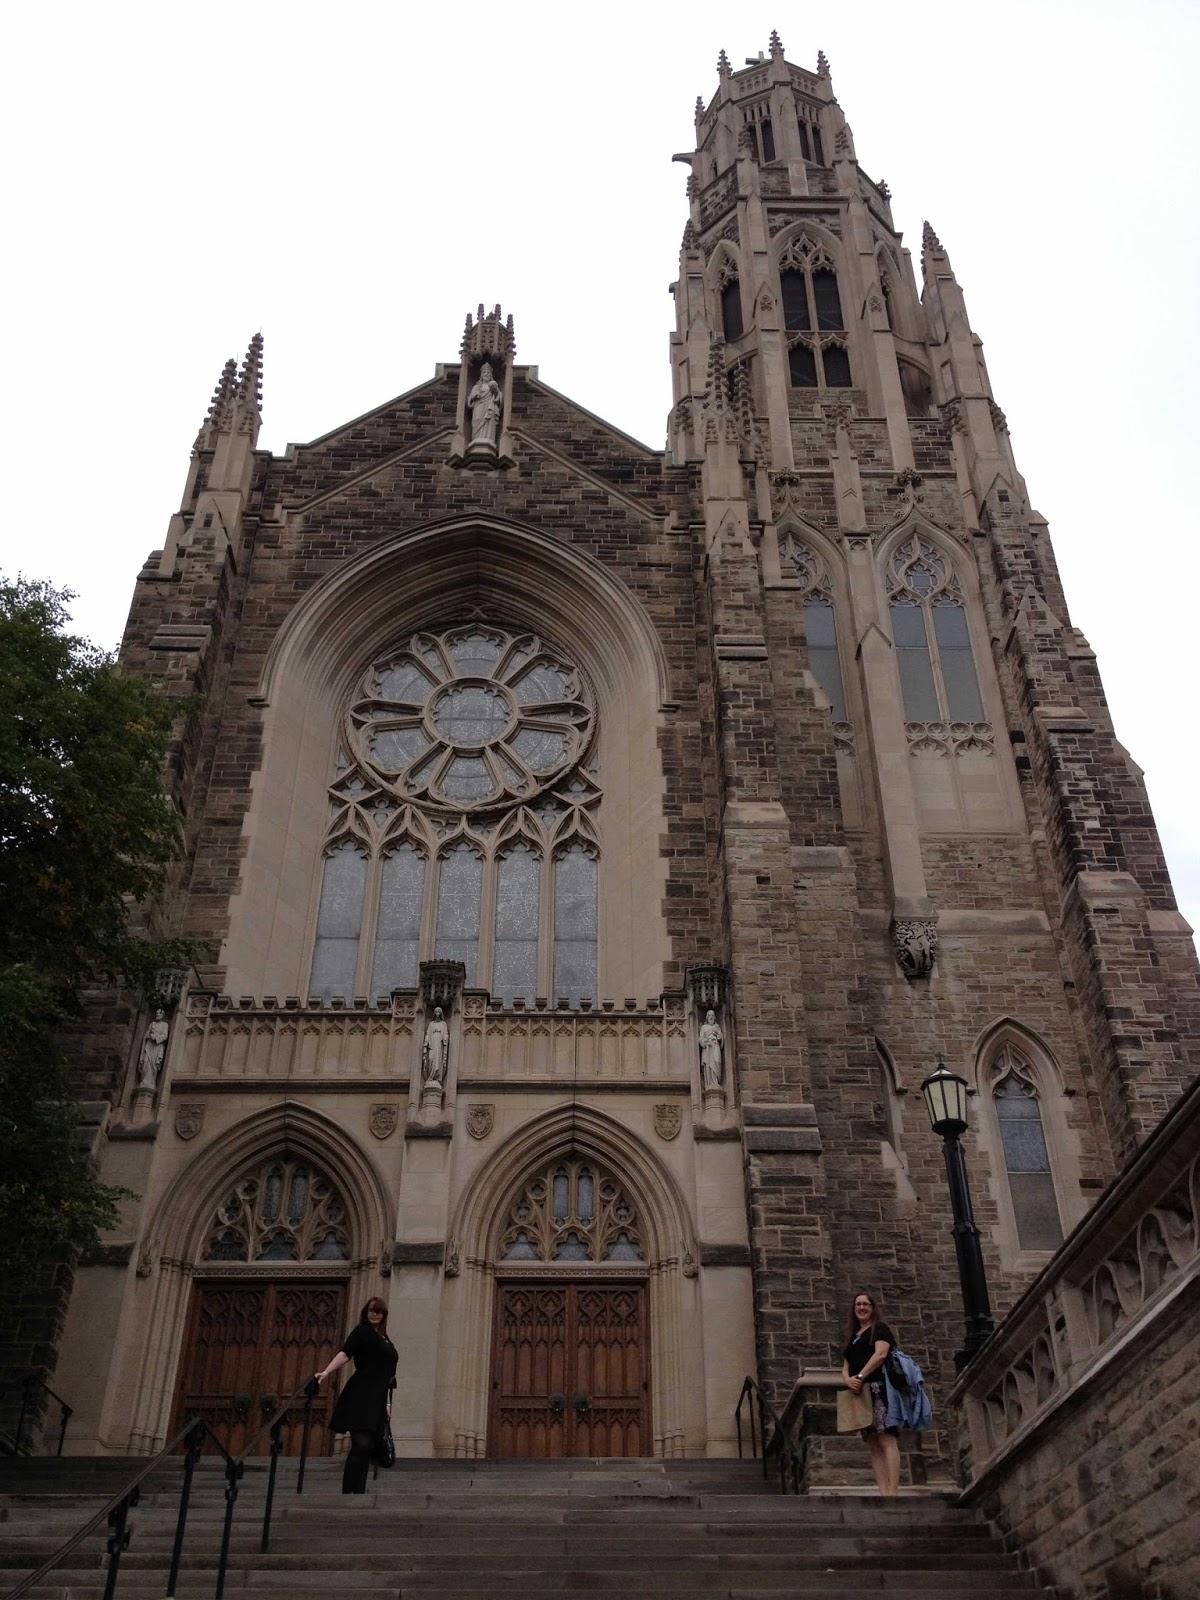 Archdiocese of hamilton